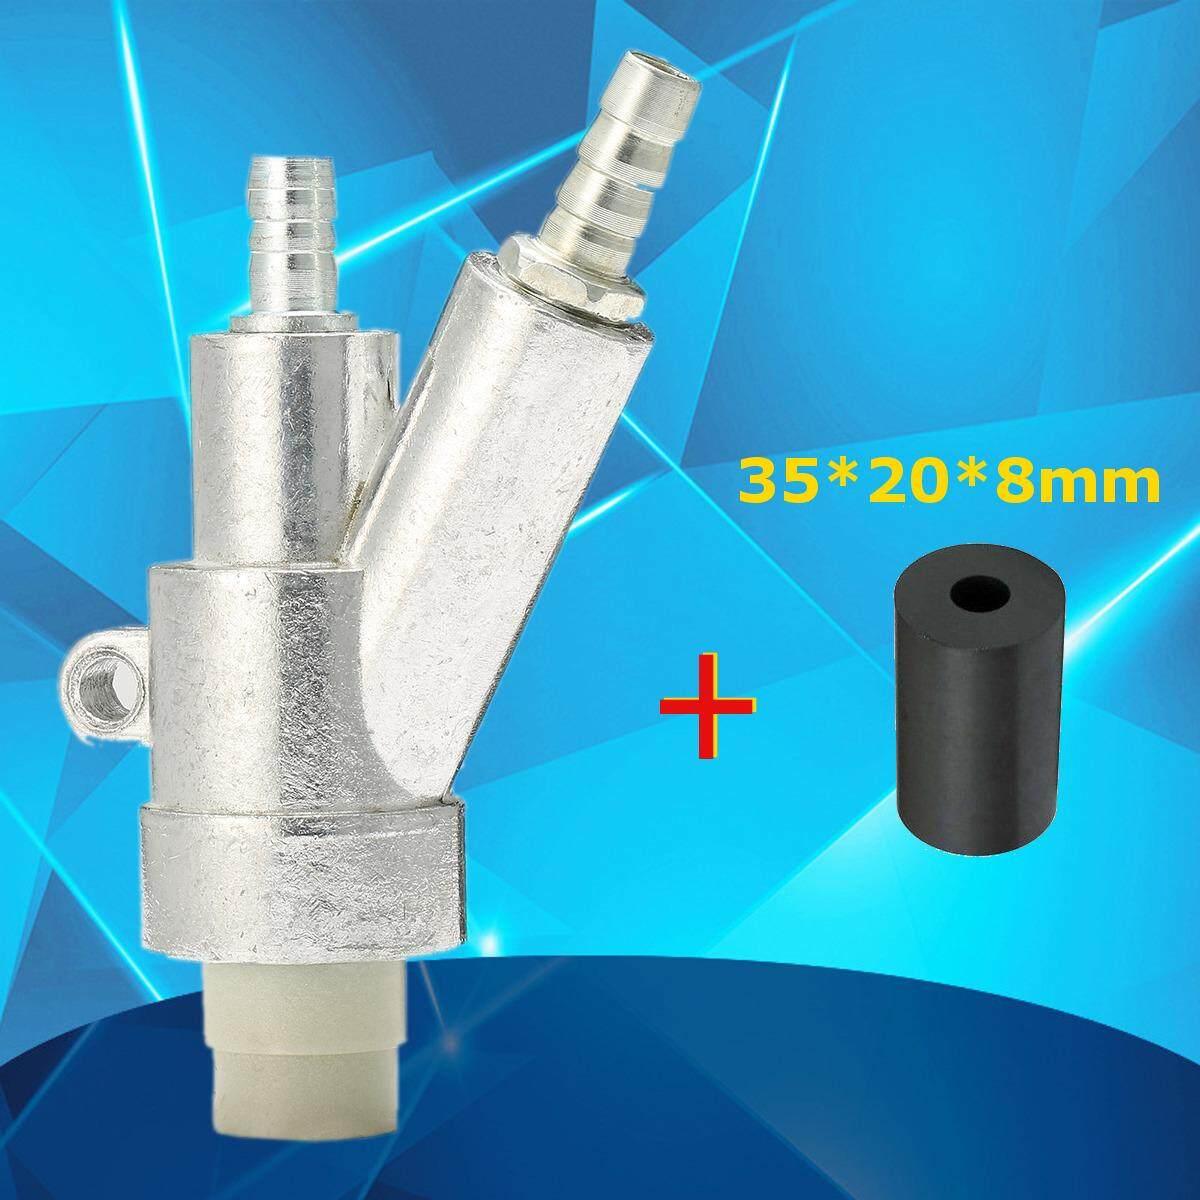 Stainless Steel Air Sandblaster Kits Sprayer with 35mm Boron Carbide